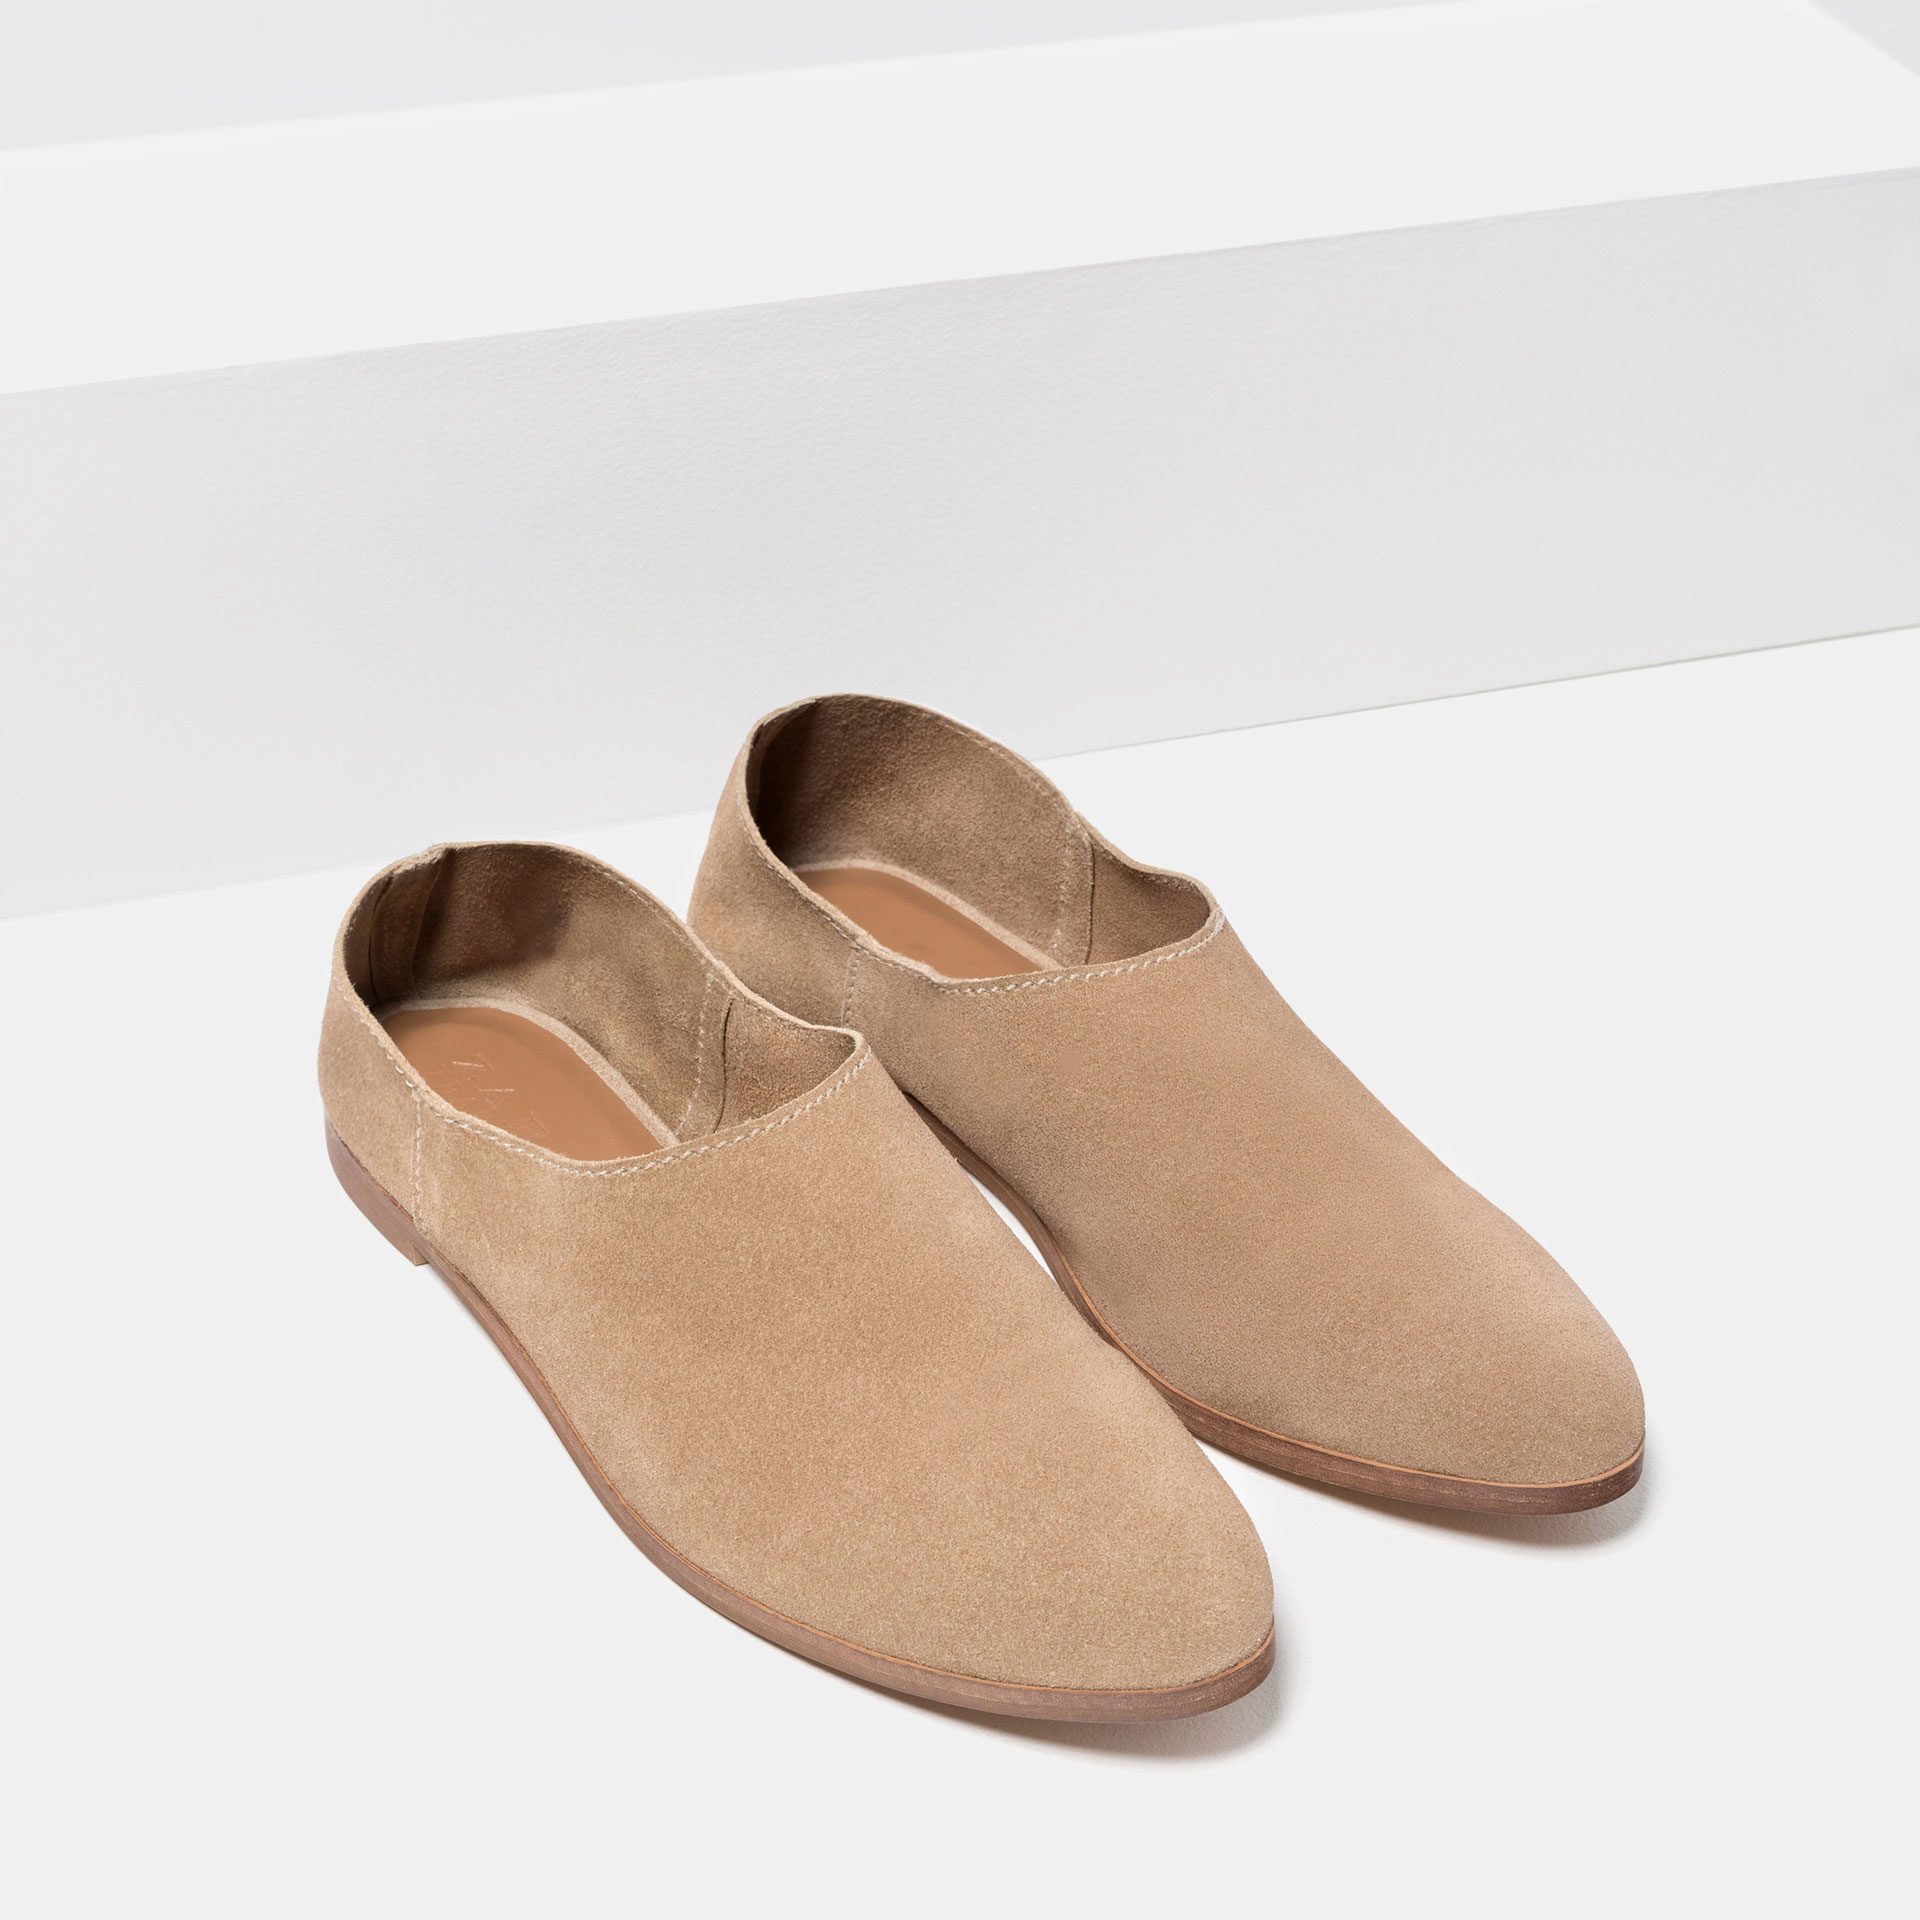 Pele Leather Shoes